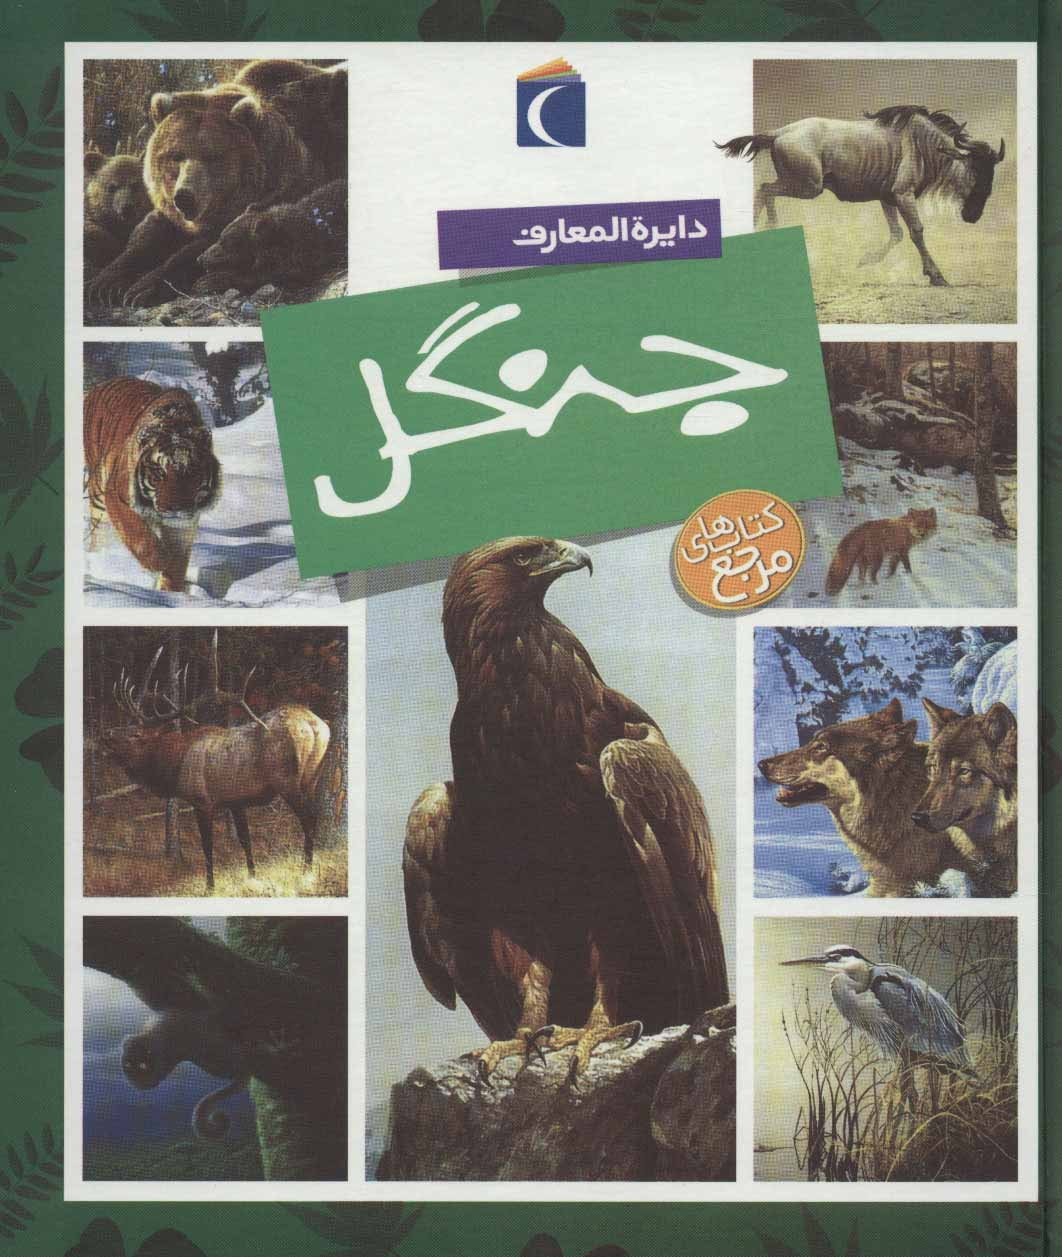 کتاب دایره المعارف جنگل